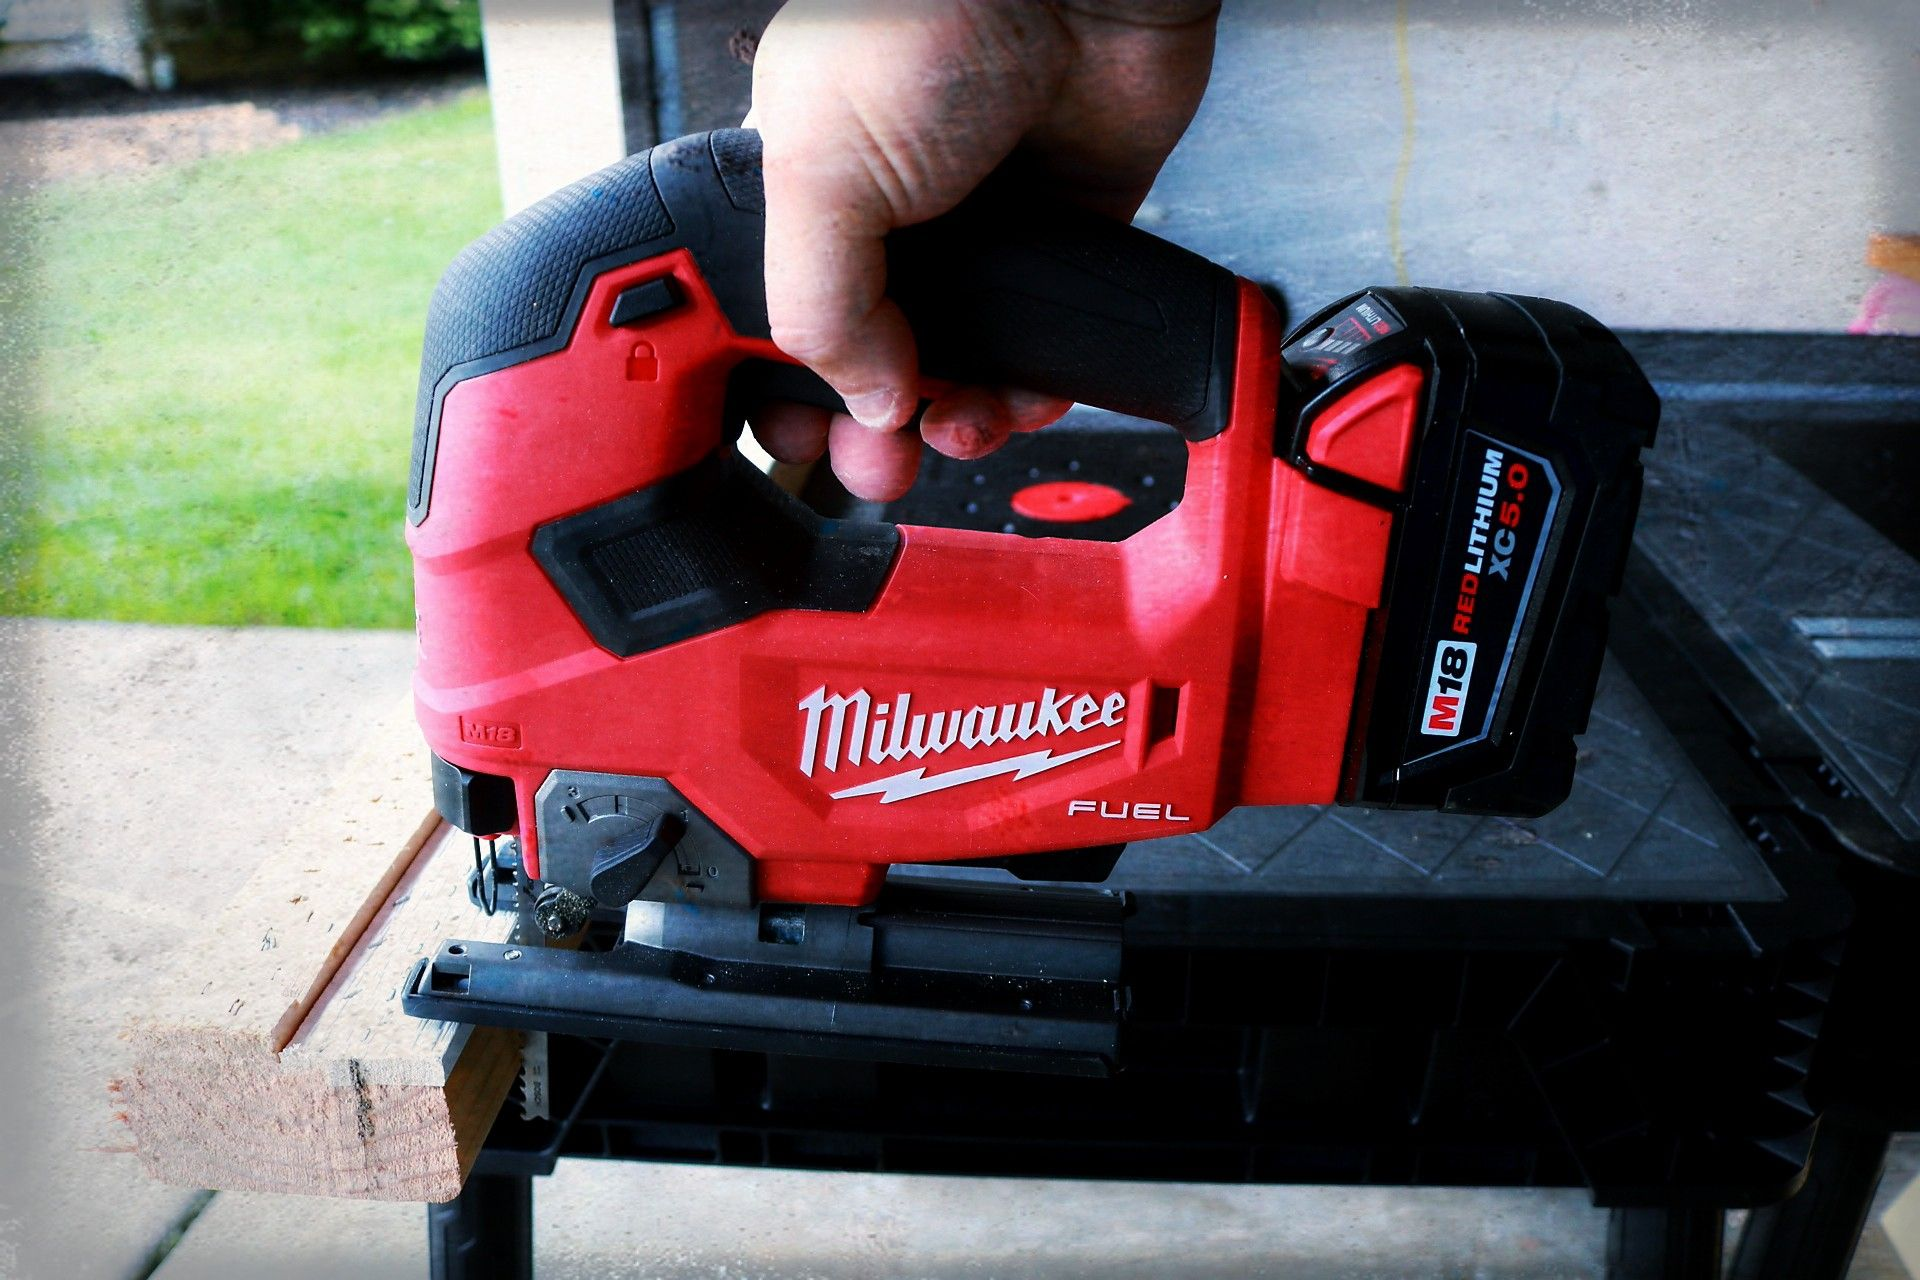 Milwaukee Tools M18 Fuel Cordless Jigsaw With Images Milwaukee Tools Outdoor Power Equipment Milwaukee